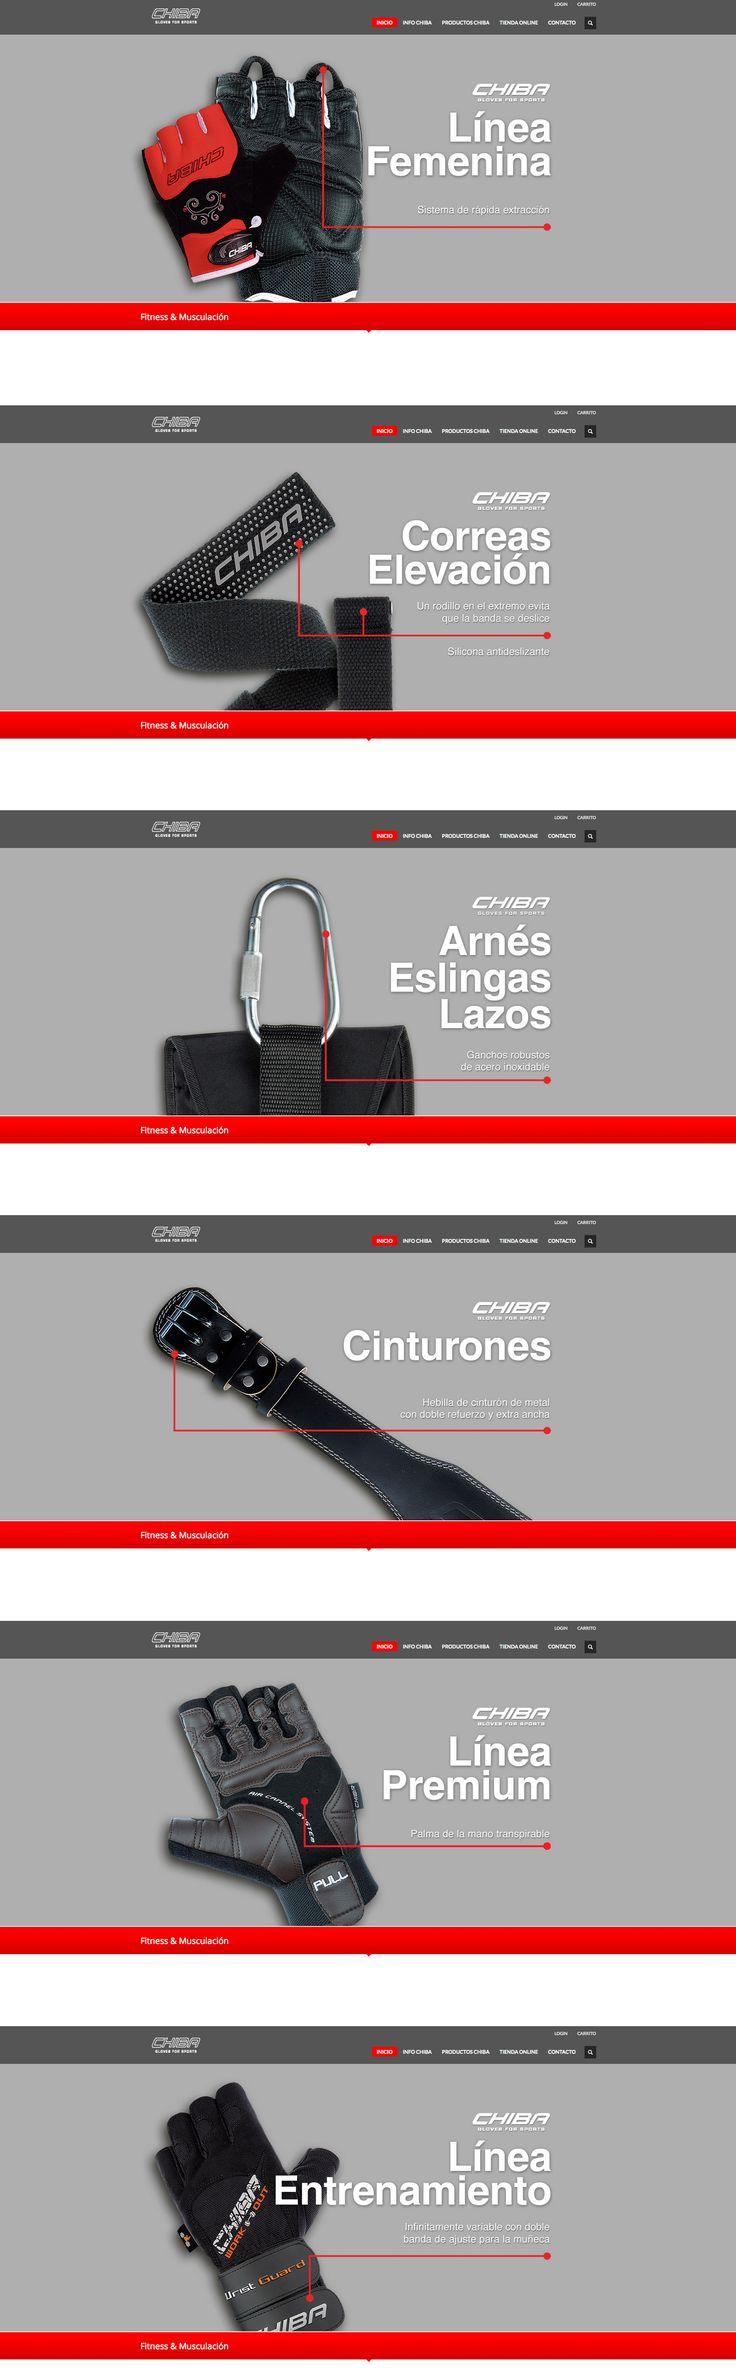 Chiba Guantes. Diseño de web. BANNERS. Eugenia Parra.  http://chiba.es http://eugeniaparra.es